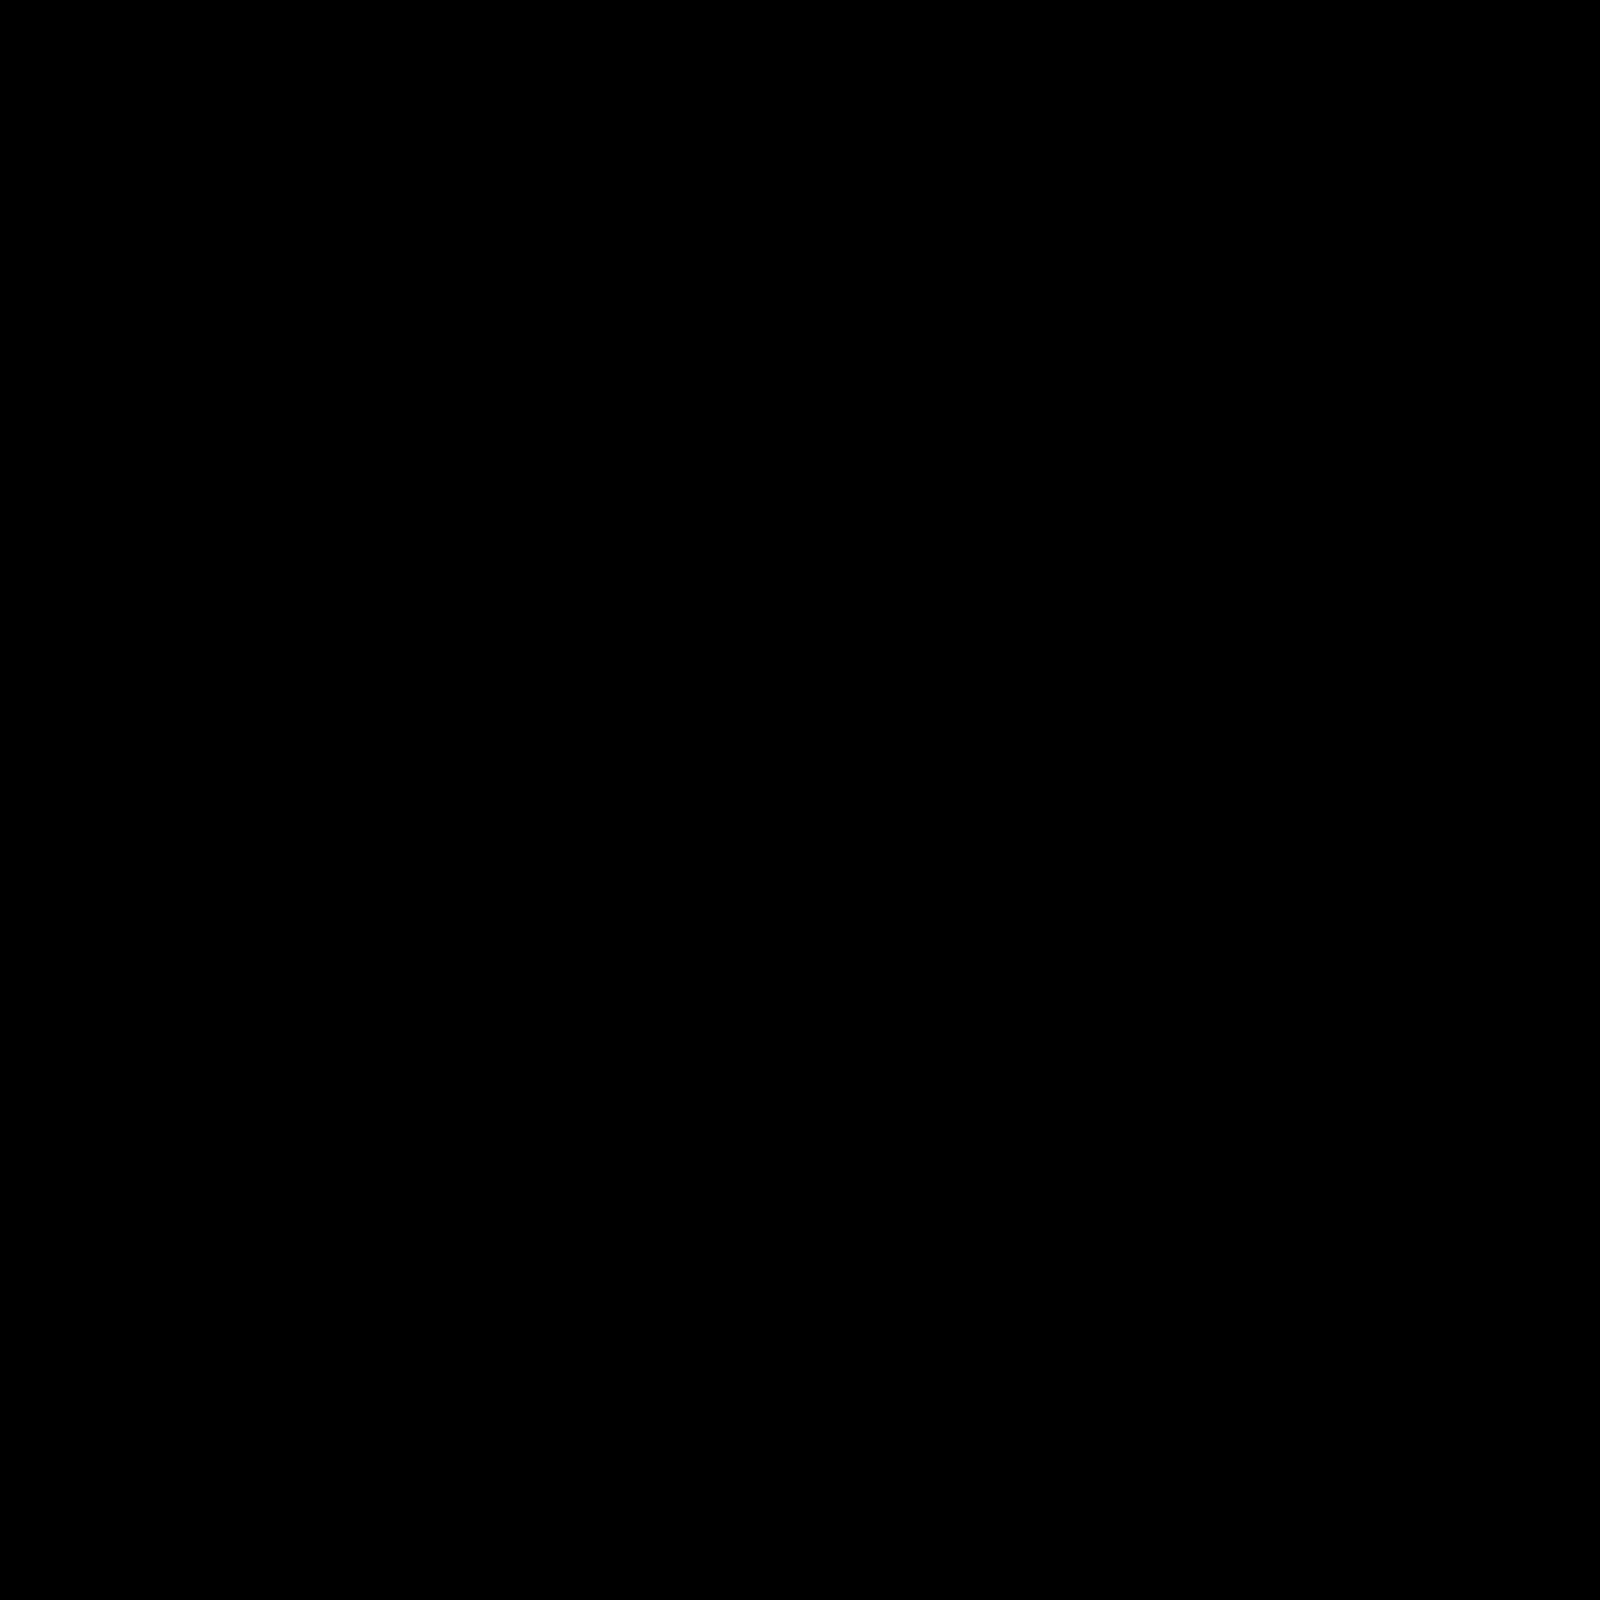 Torpedo icon